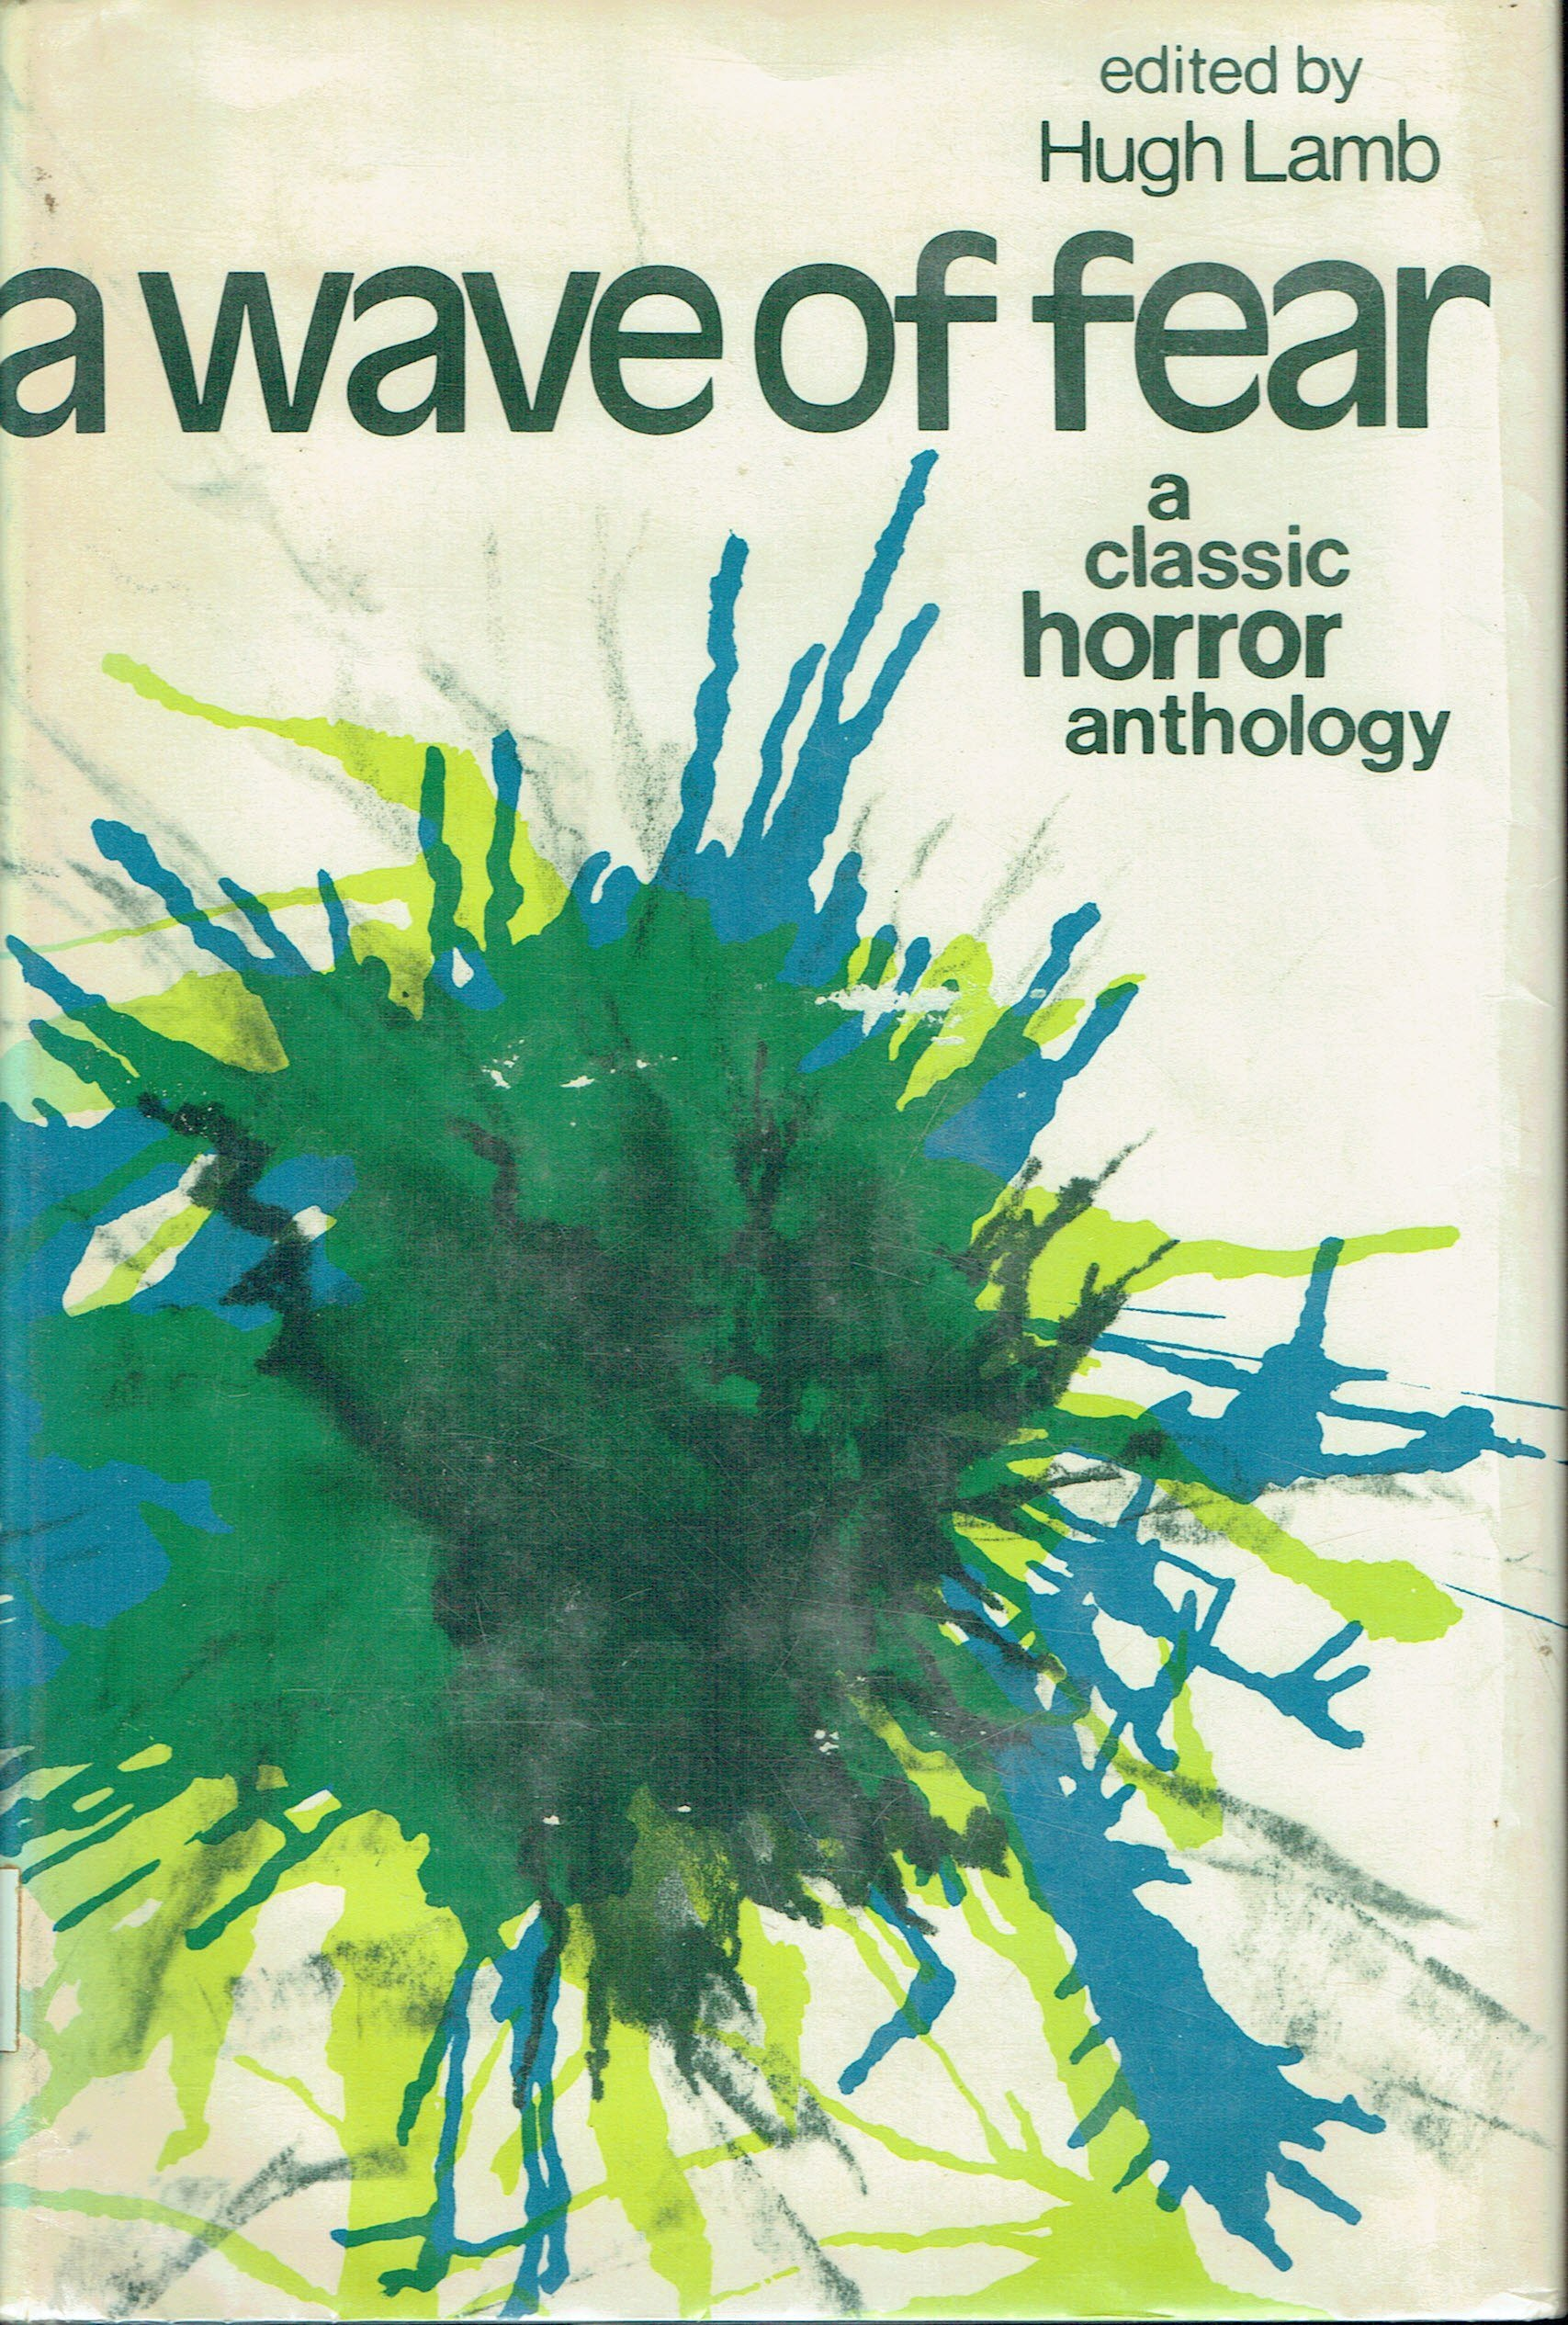 A Wave of Fear: A Classic Horror Anthology by Hugh Lamb, E.F. Benson, Robert W. Chambers, L.A. Lewis, Marjorie Bowen, Frederick Cowles, Robert Hugh Benson, Charles Birkin, H. Russell Wakefield, Vivian Meik, Eleanor Scott, D.K. Browster, A.C. Benson, Ambrose Bierce, M.P. Shiel, J.D. Beresford, Joy Burnett, L.T.C. Rolt